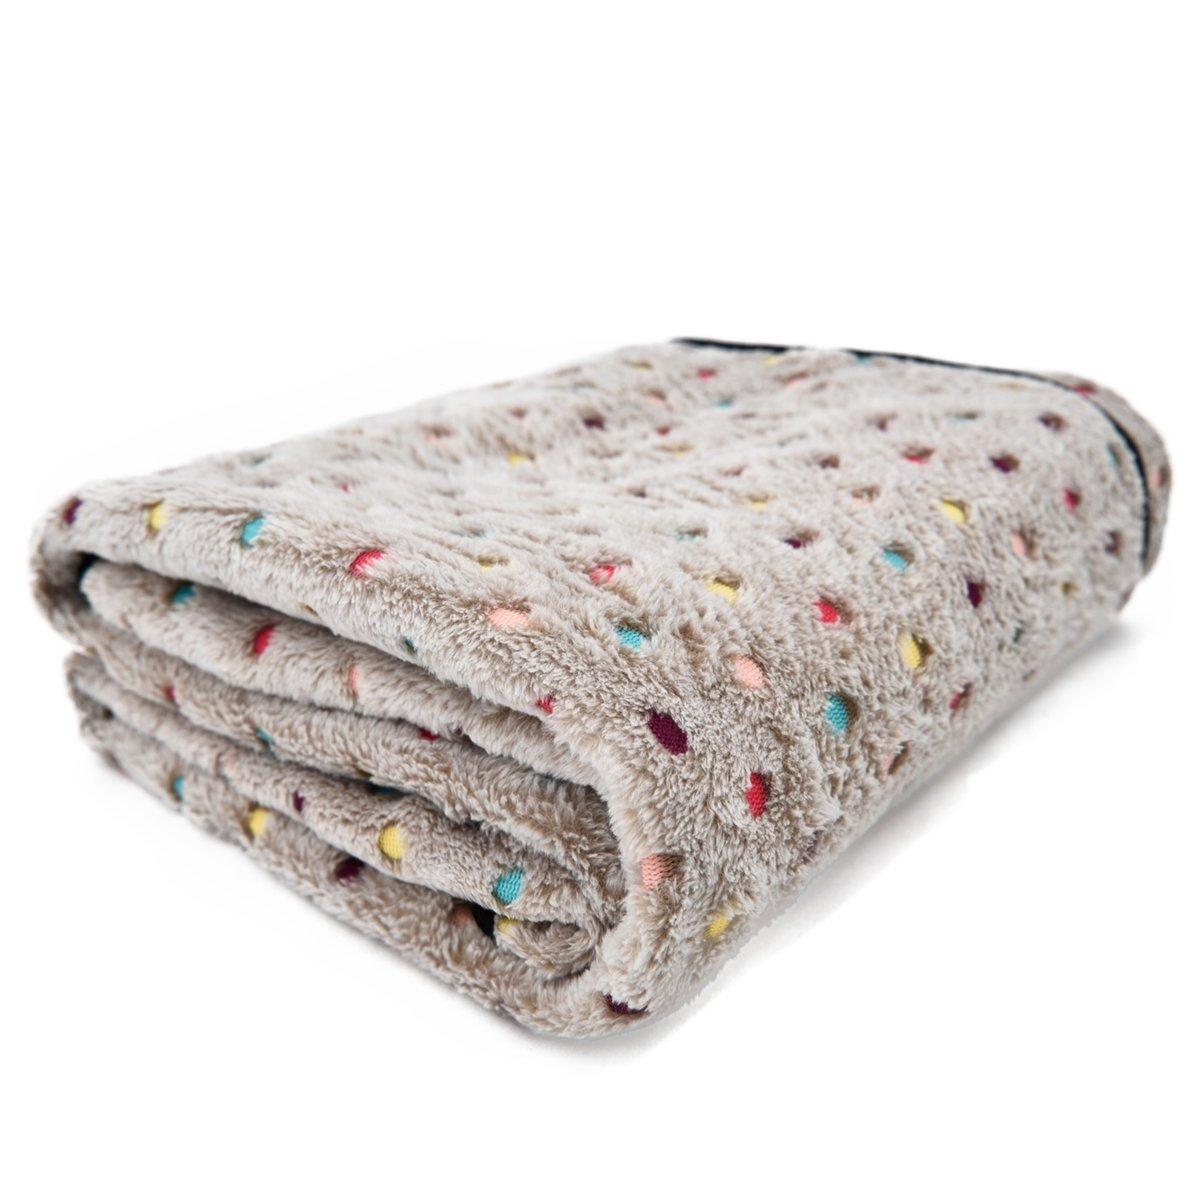 PAWZ Road Pet Dog Blanket Fleece Fabric Soft and Cute Grey M